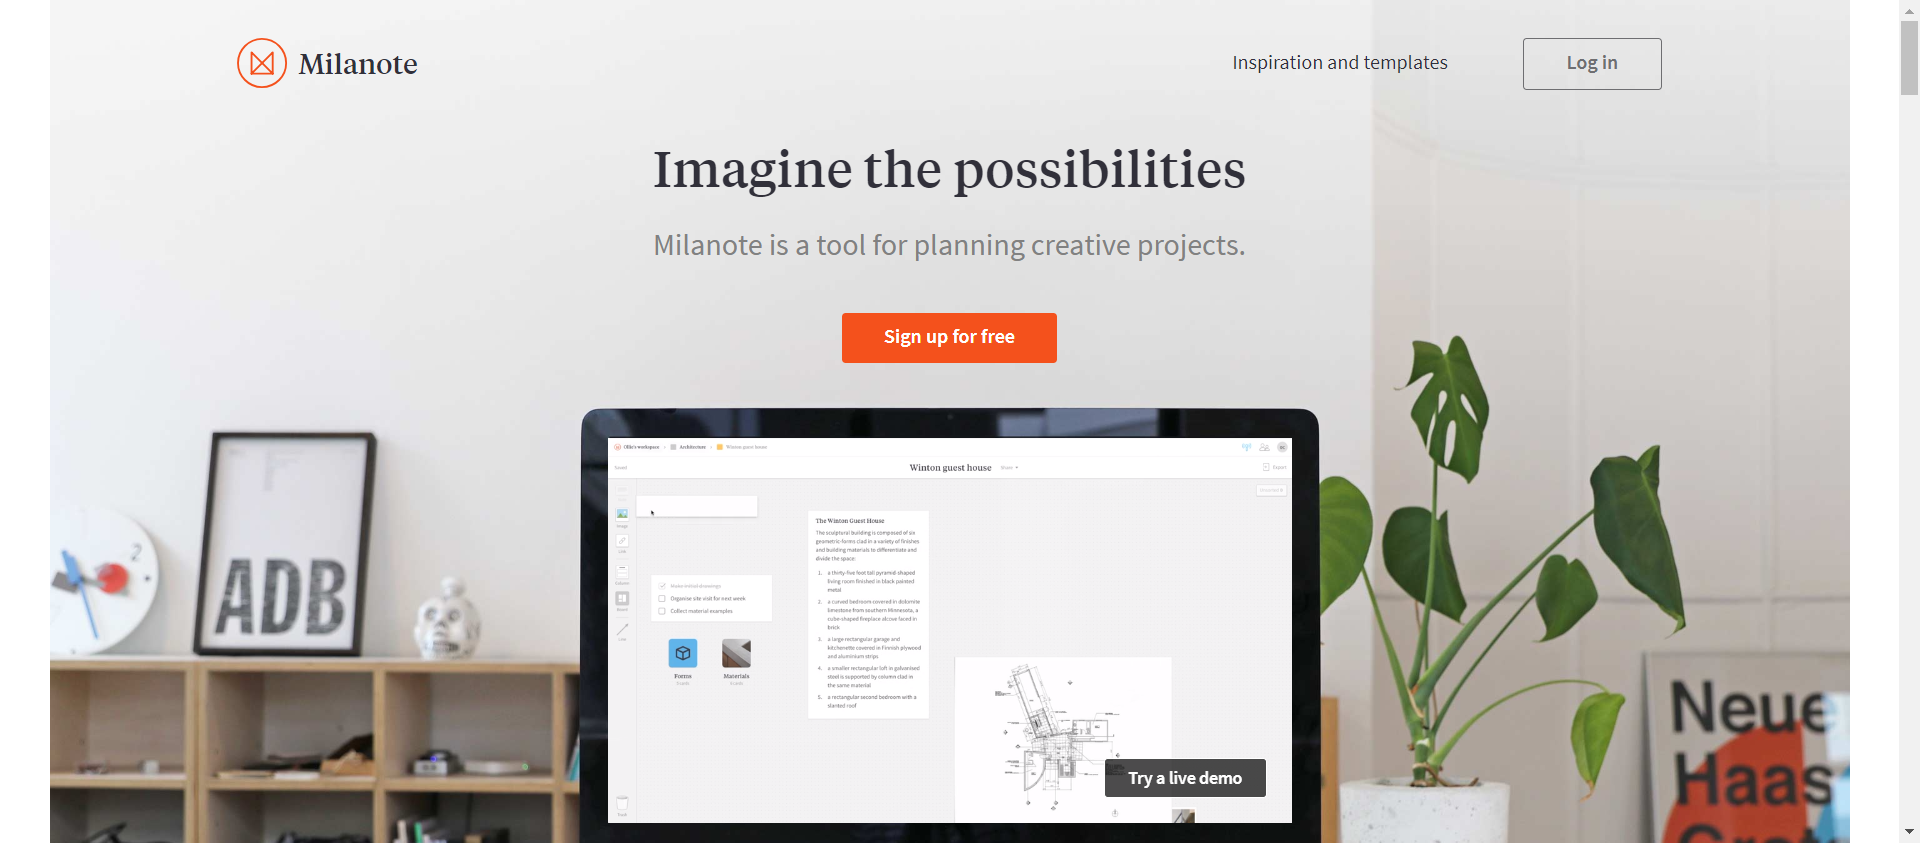 Milanote website image